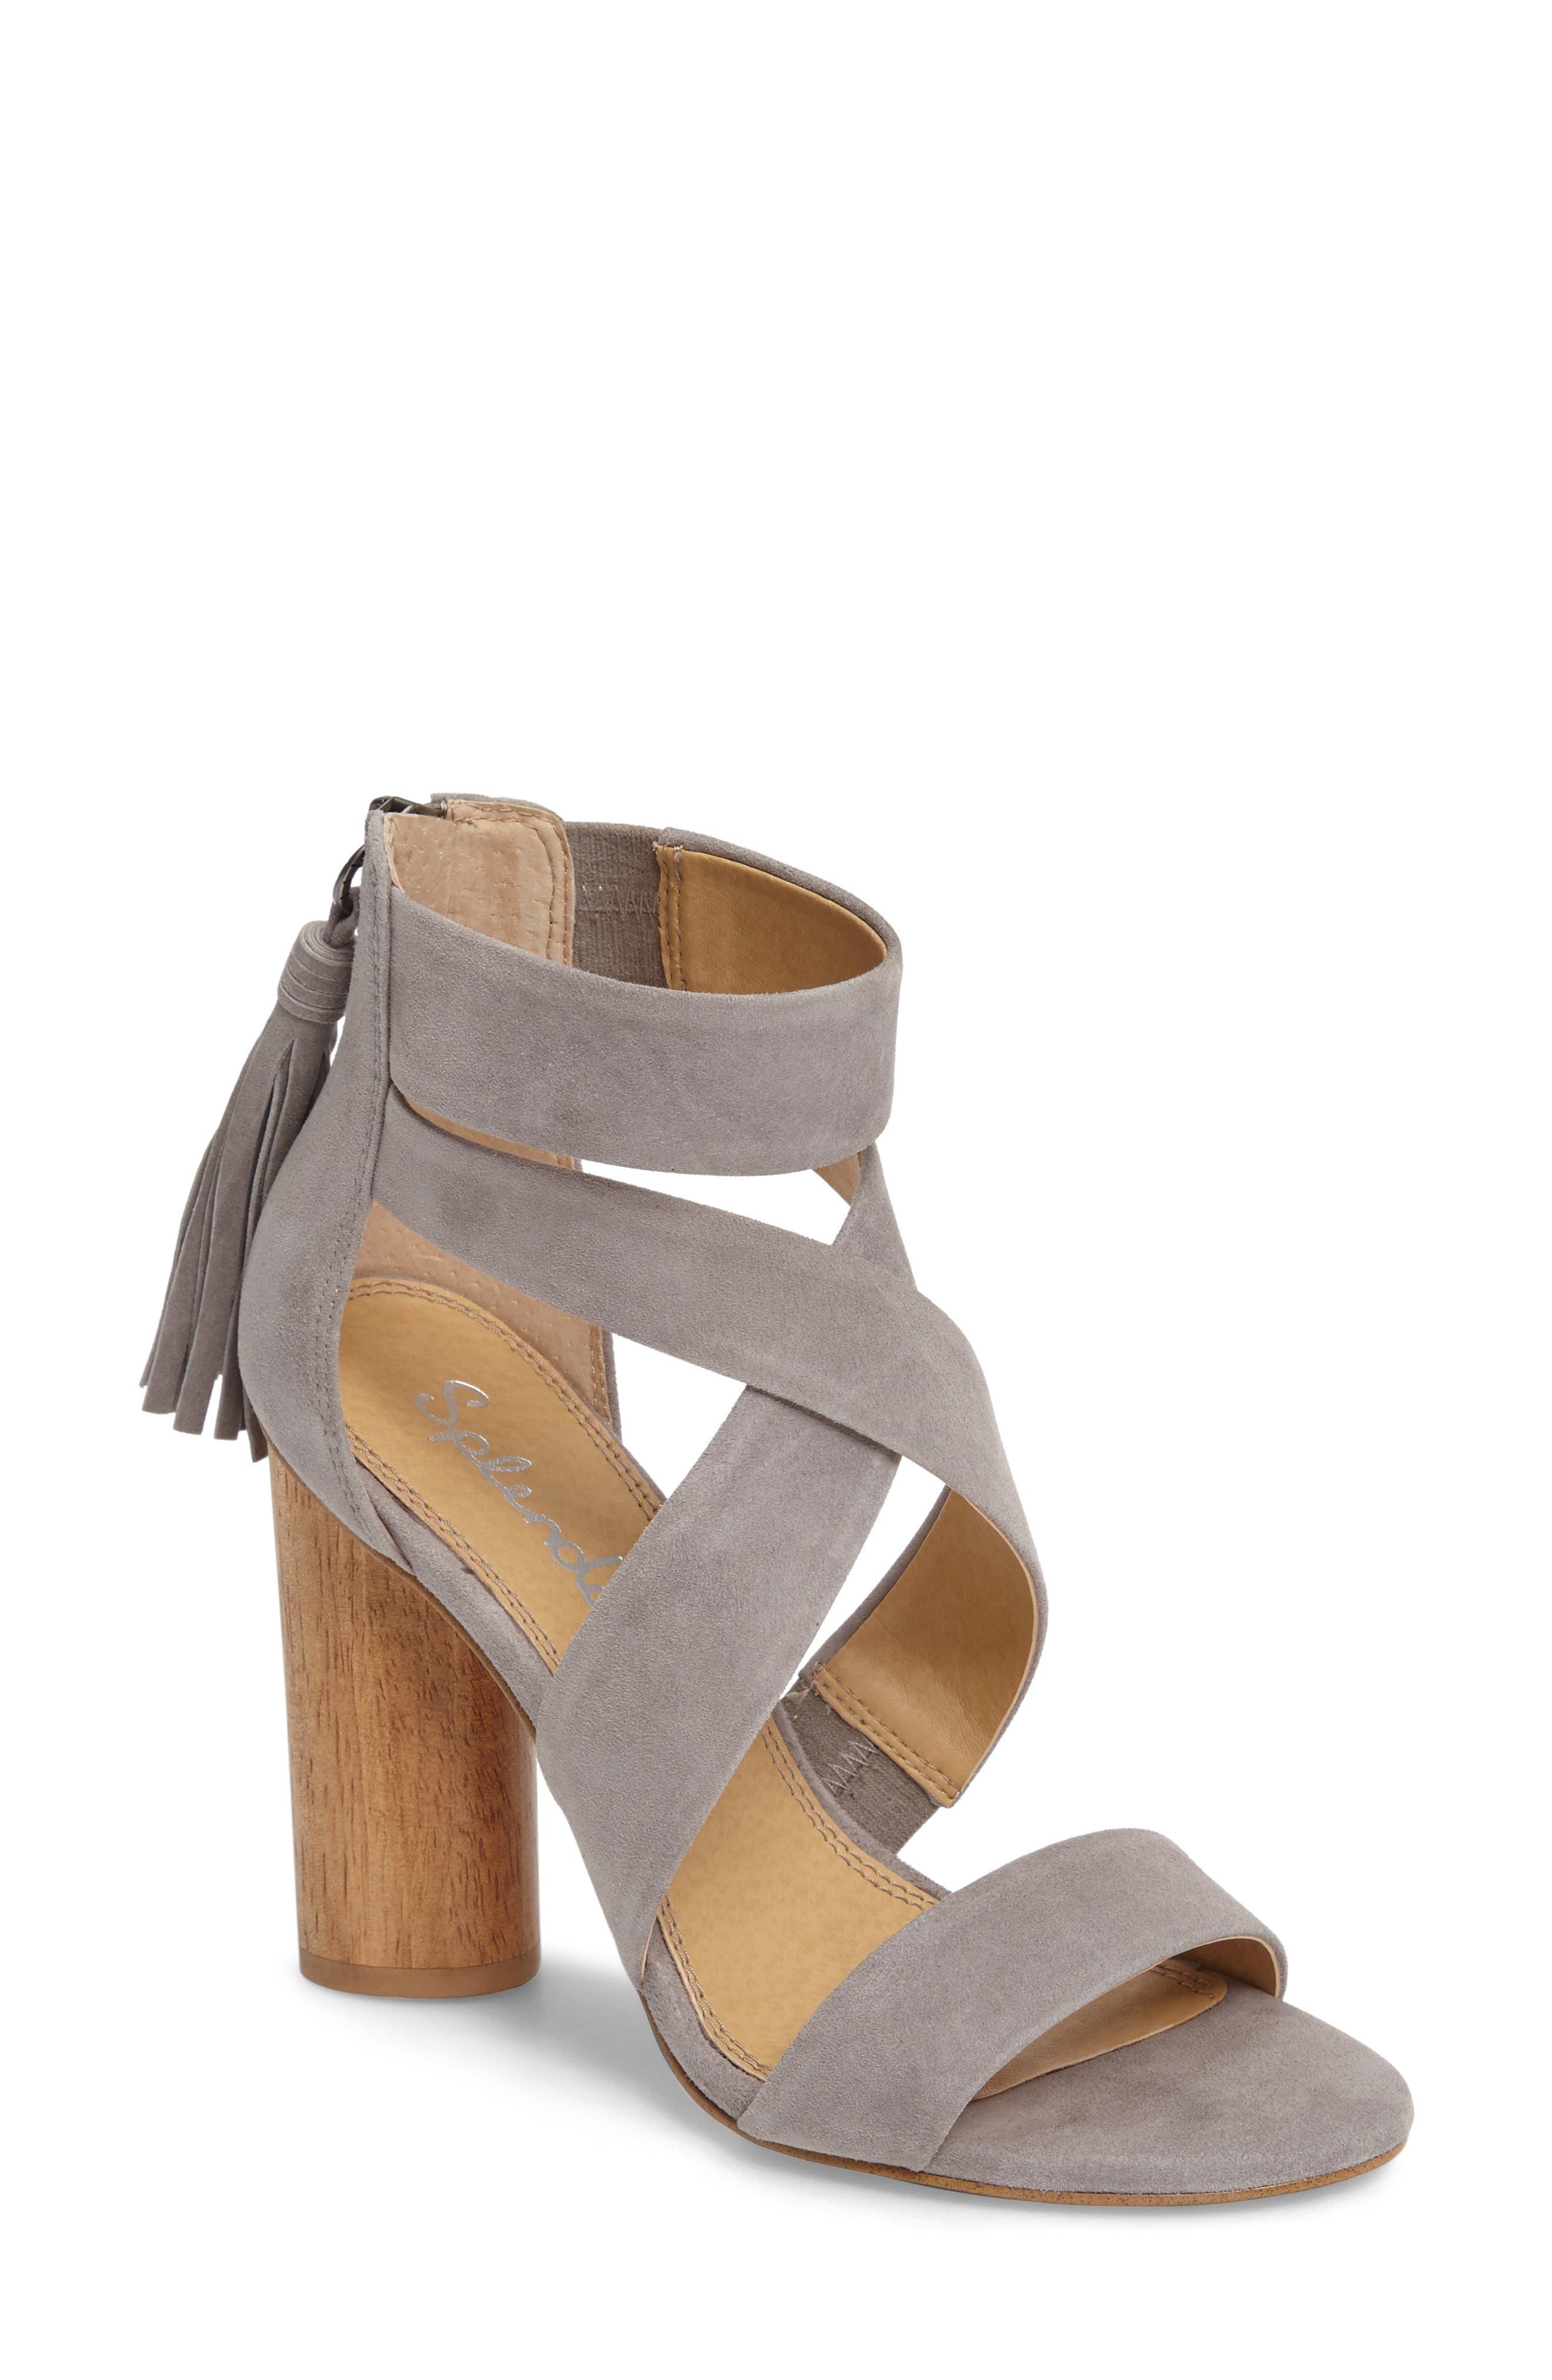 Jara Statement Heel Sandal,                         Main,                         color, Light Grey Suede